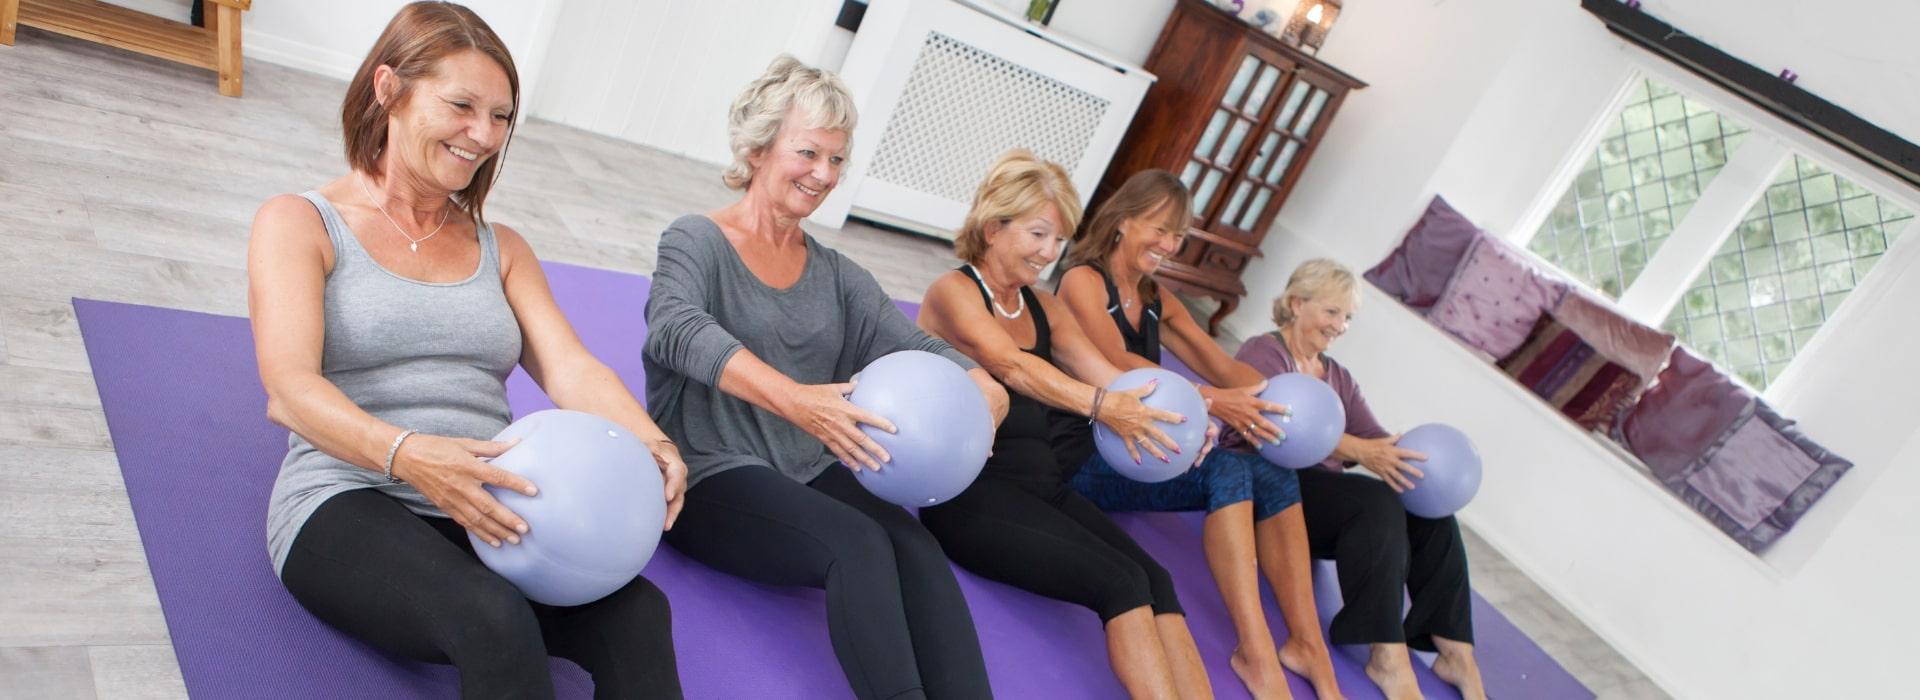 Pilates class over 60's